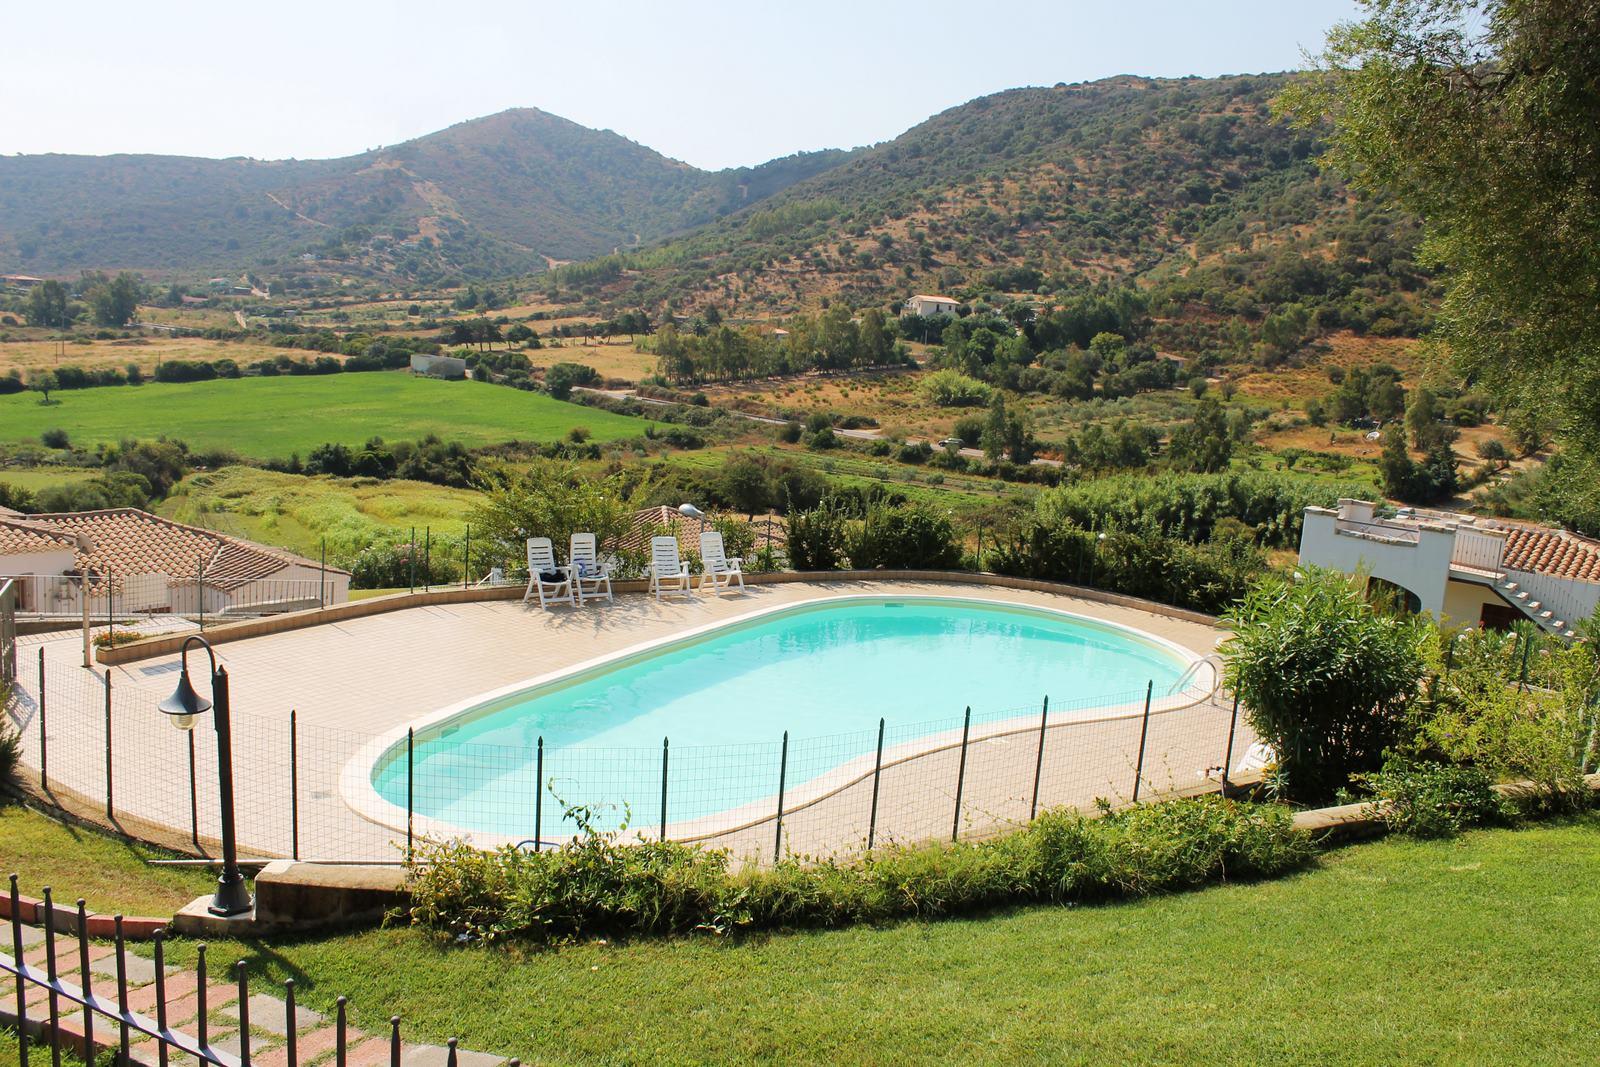 Ferienwohnung Bougan (877332), Tanaunella, Olbia-Tempio, Sardinien, Italien, Bild 32